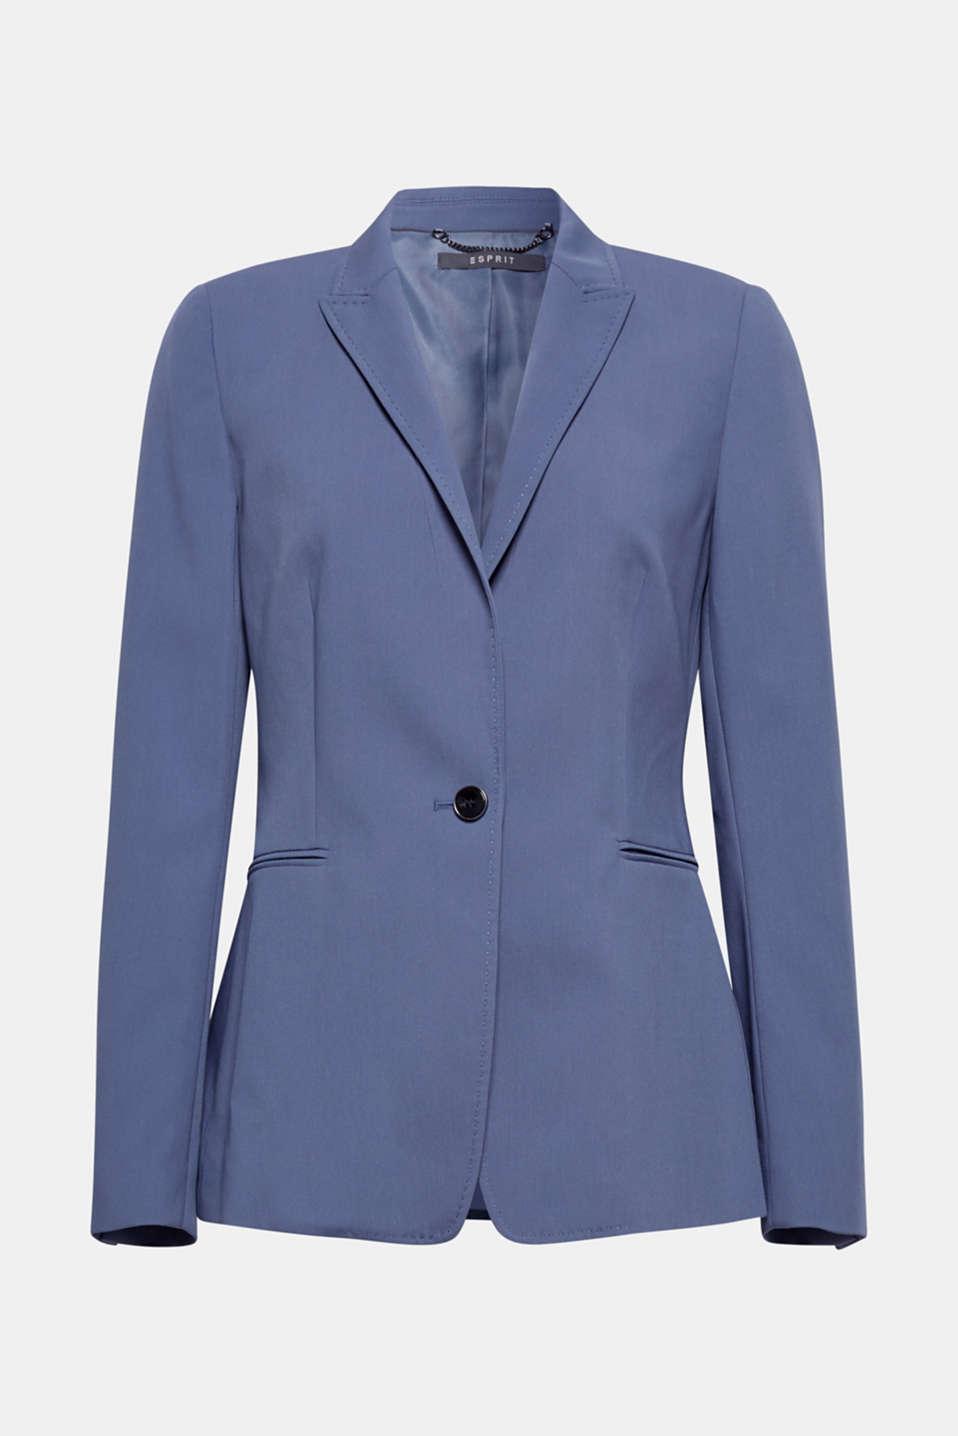 STITCHING mix + match stretch blazer, GREY BLUE 2, detail image number 8